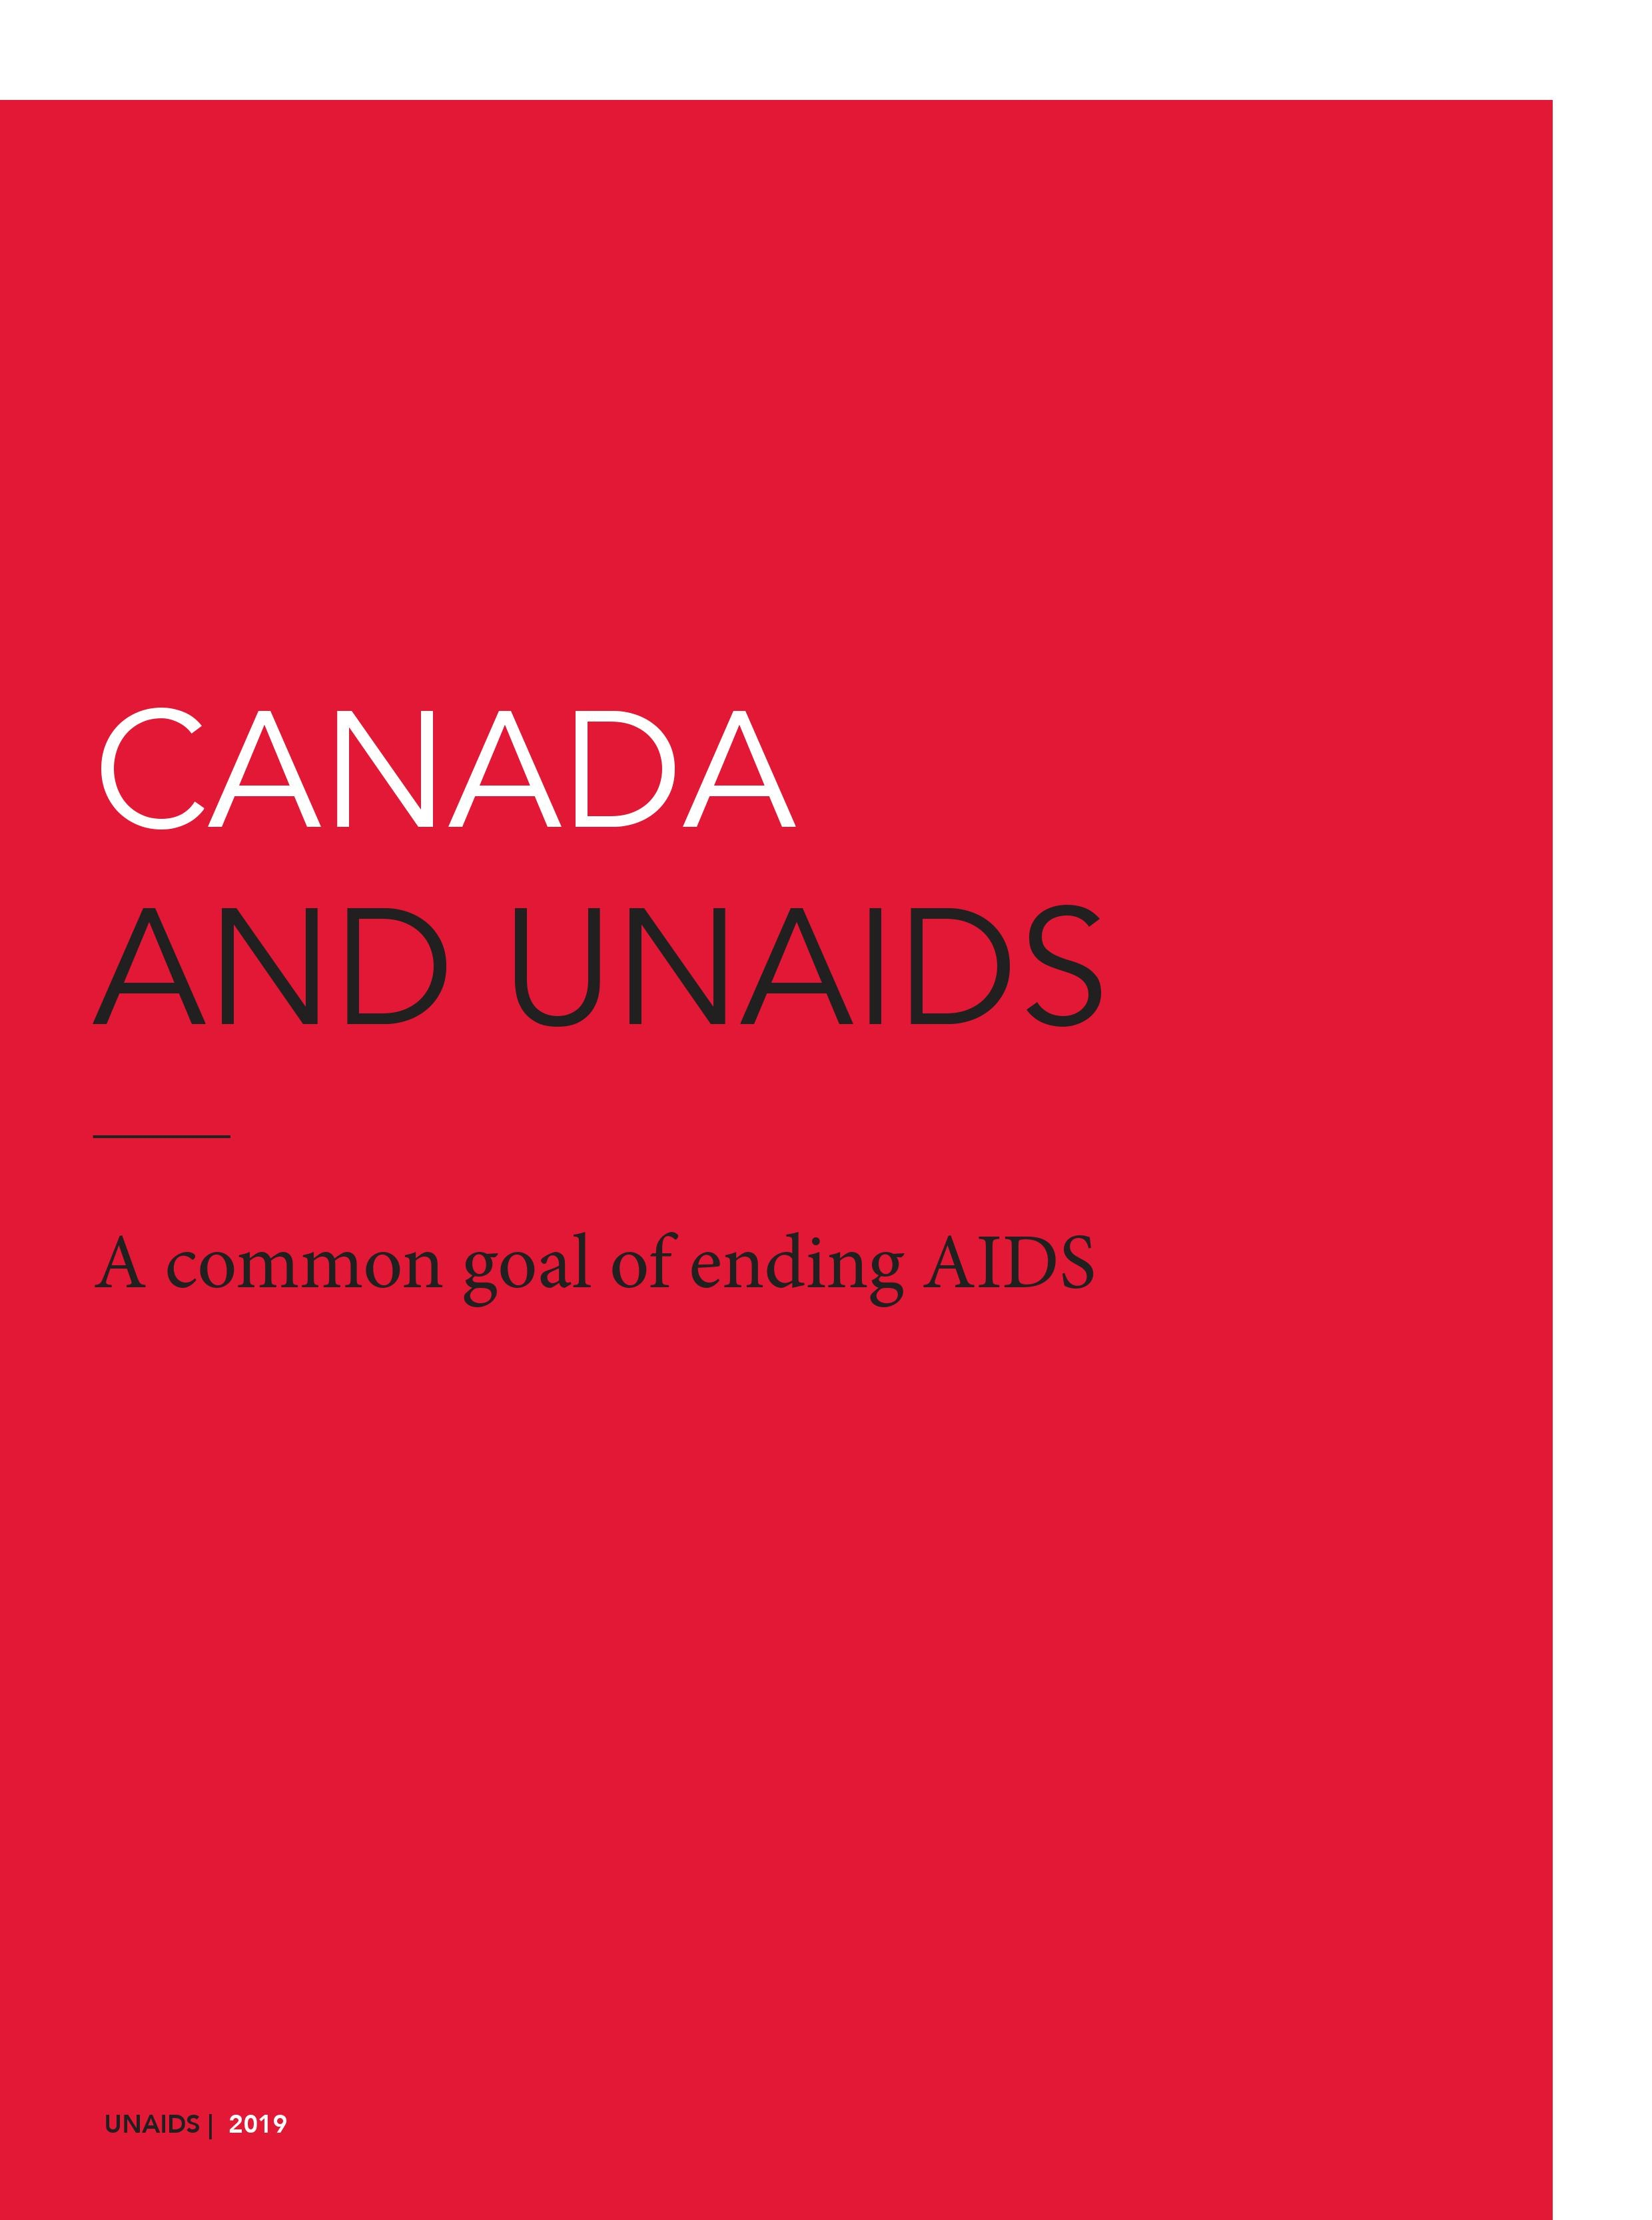 Canada and UNAIDS